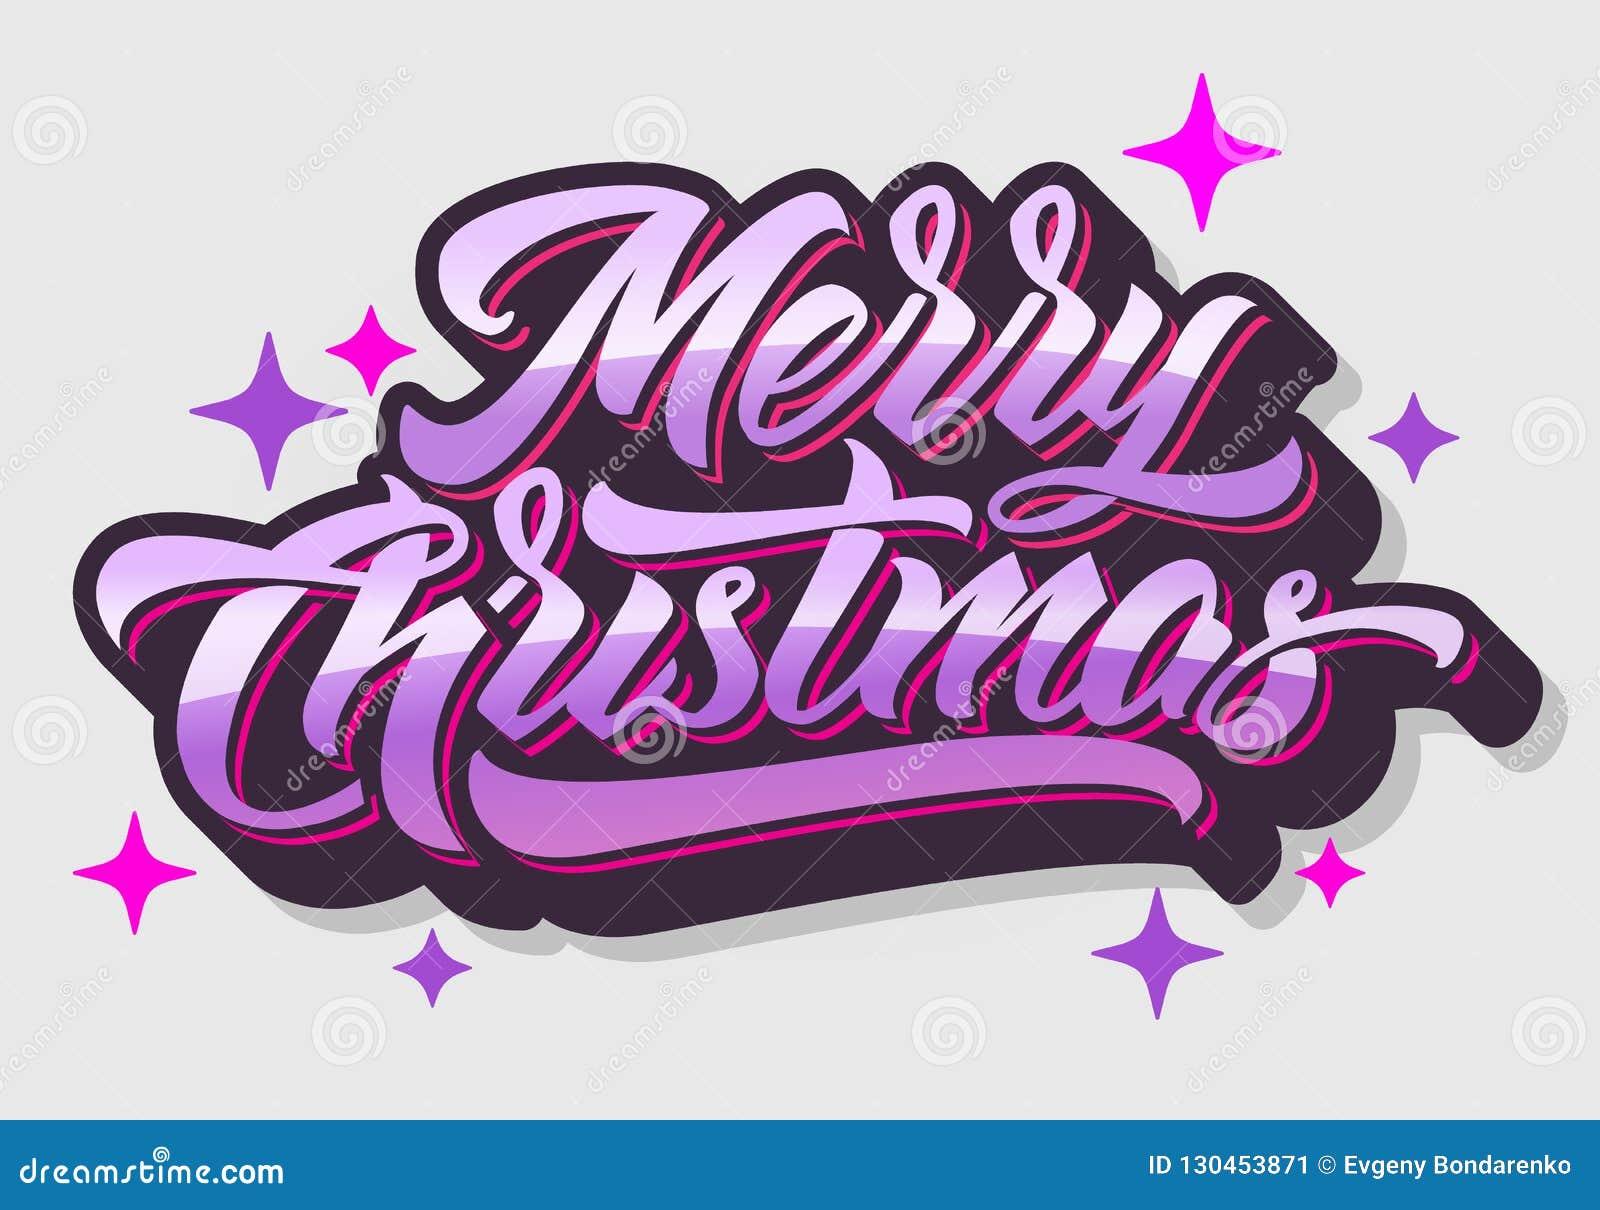 Christmas Graffiti Background.Merry Christmas 2019 Hand Lettering Stock Illustration